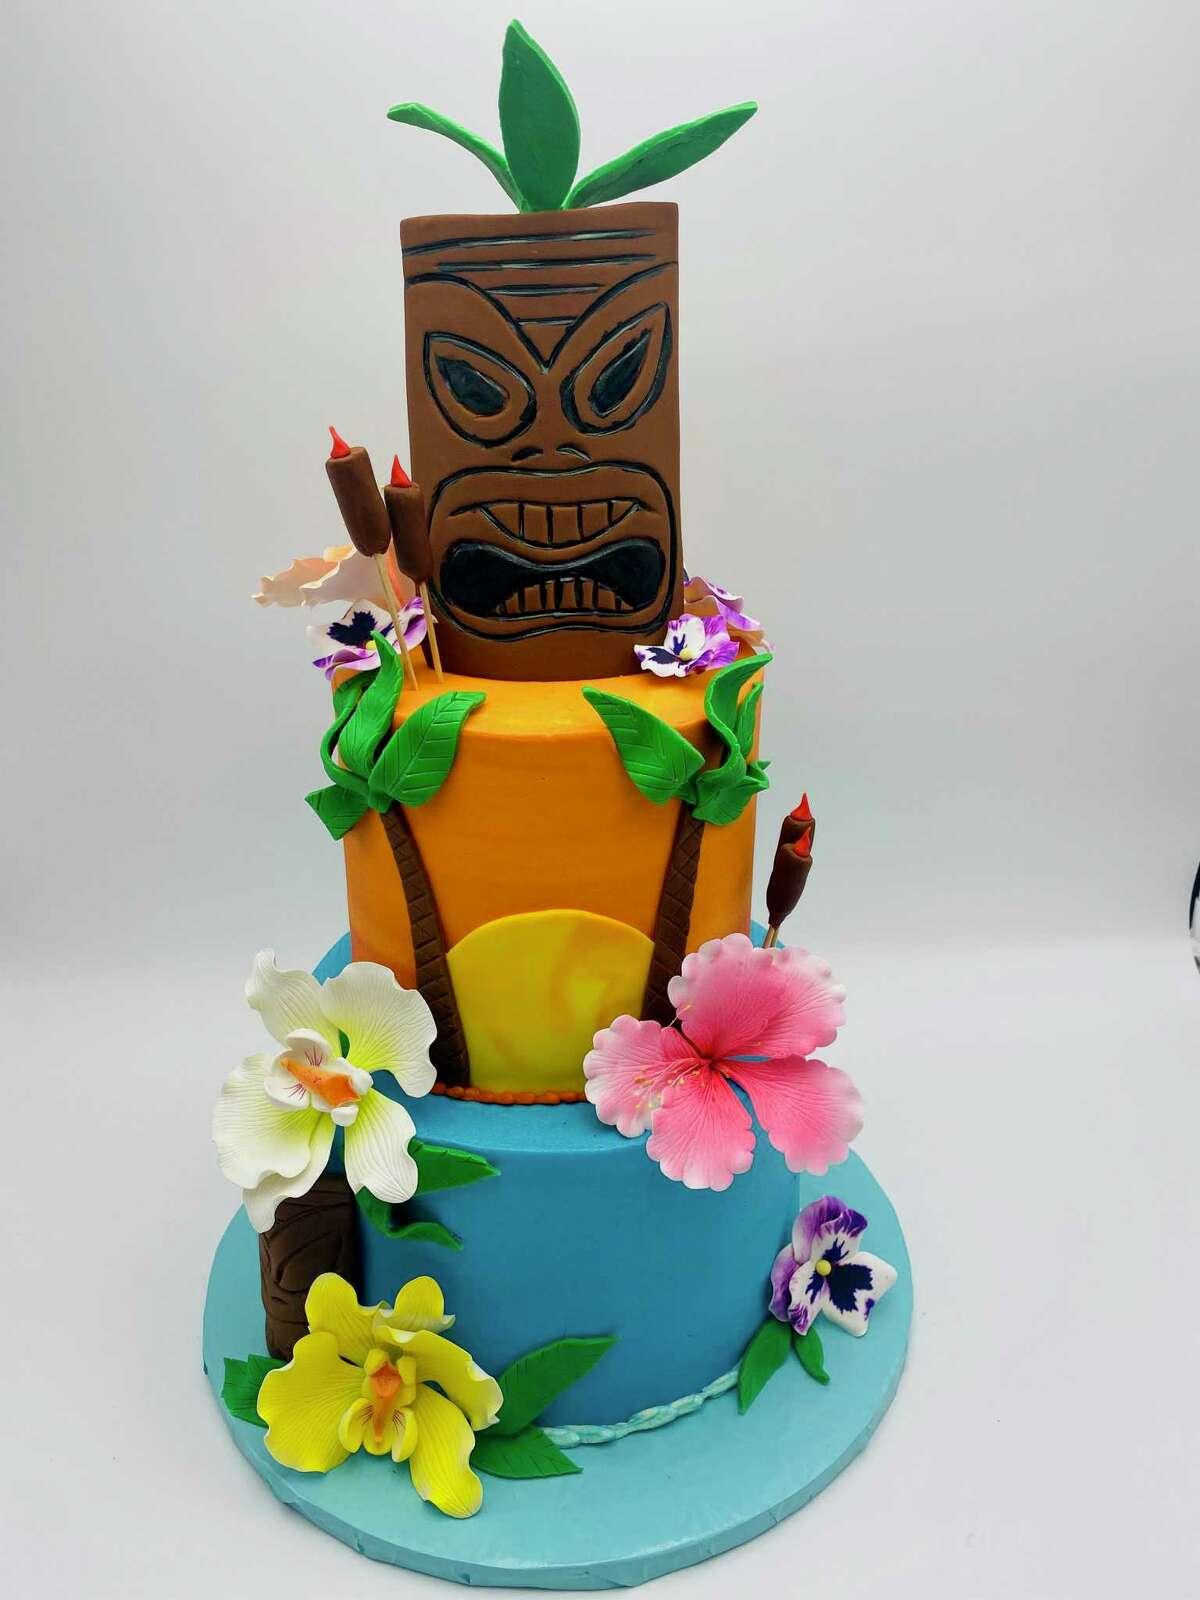 Hardcore Sweet in Watertown specializes in making custom cakes.